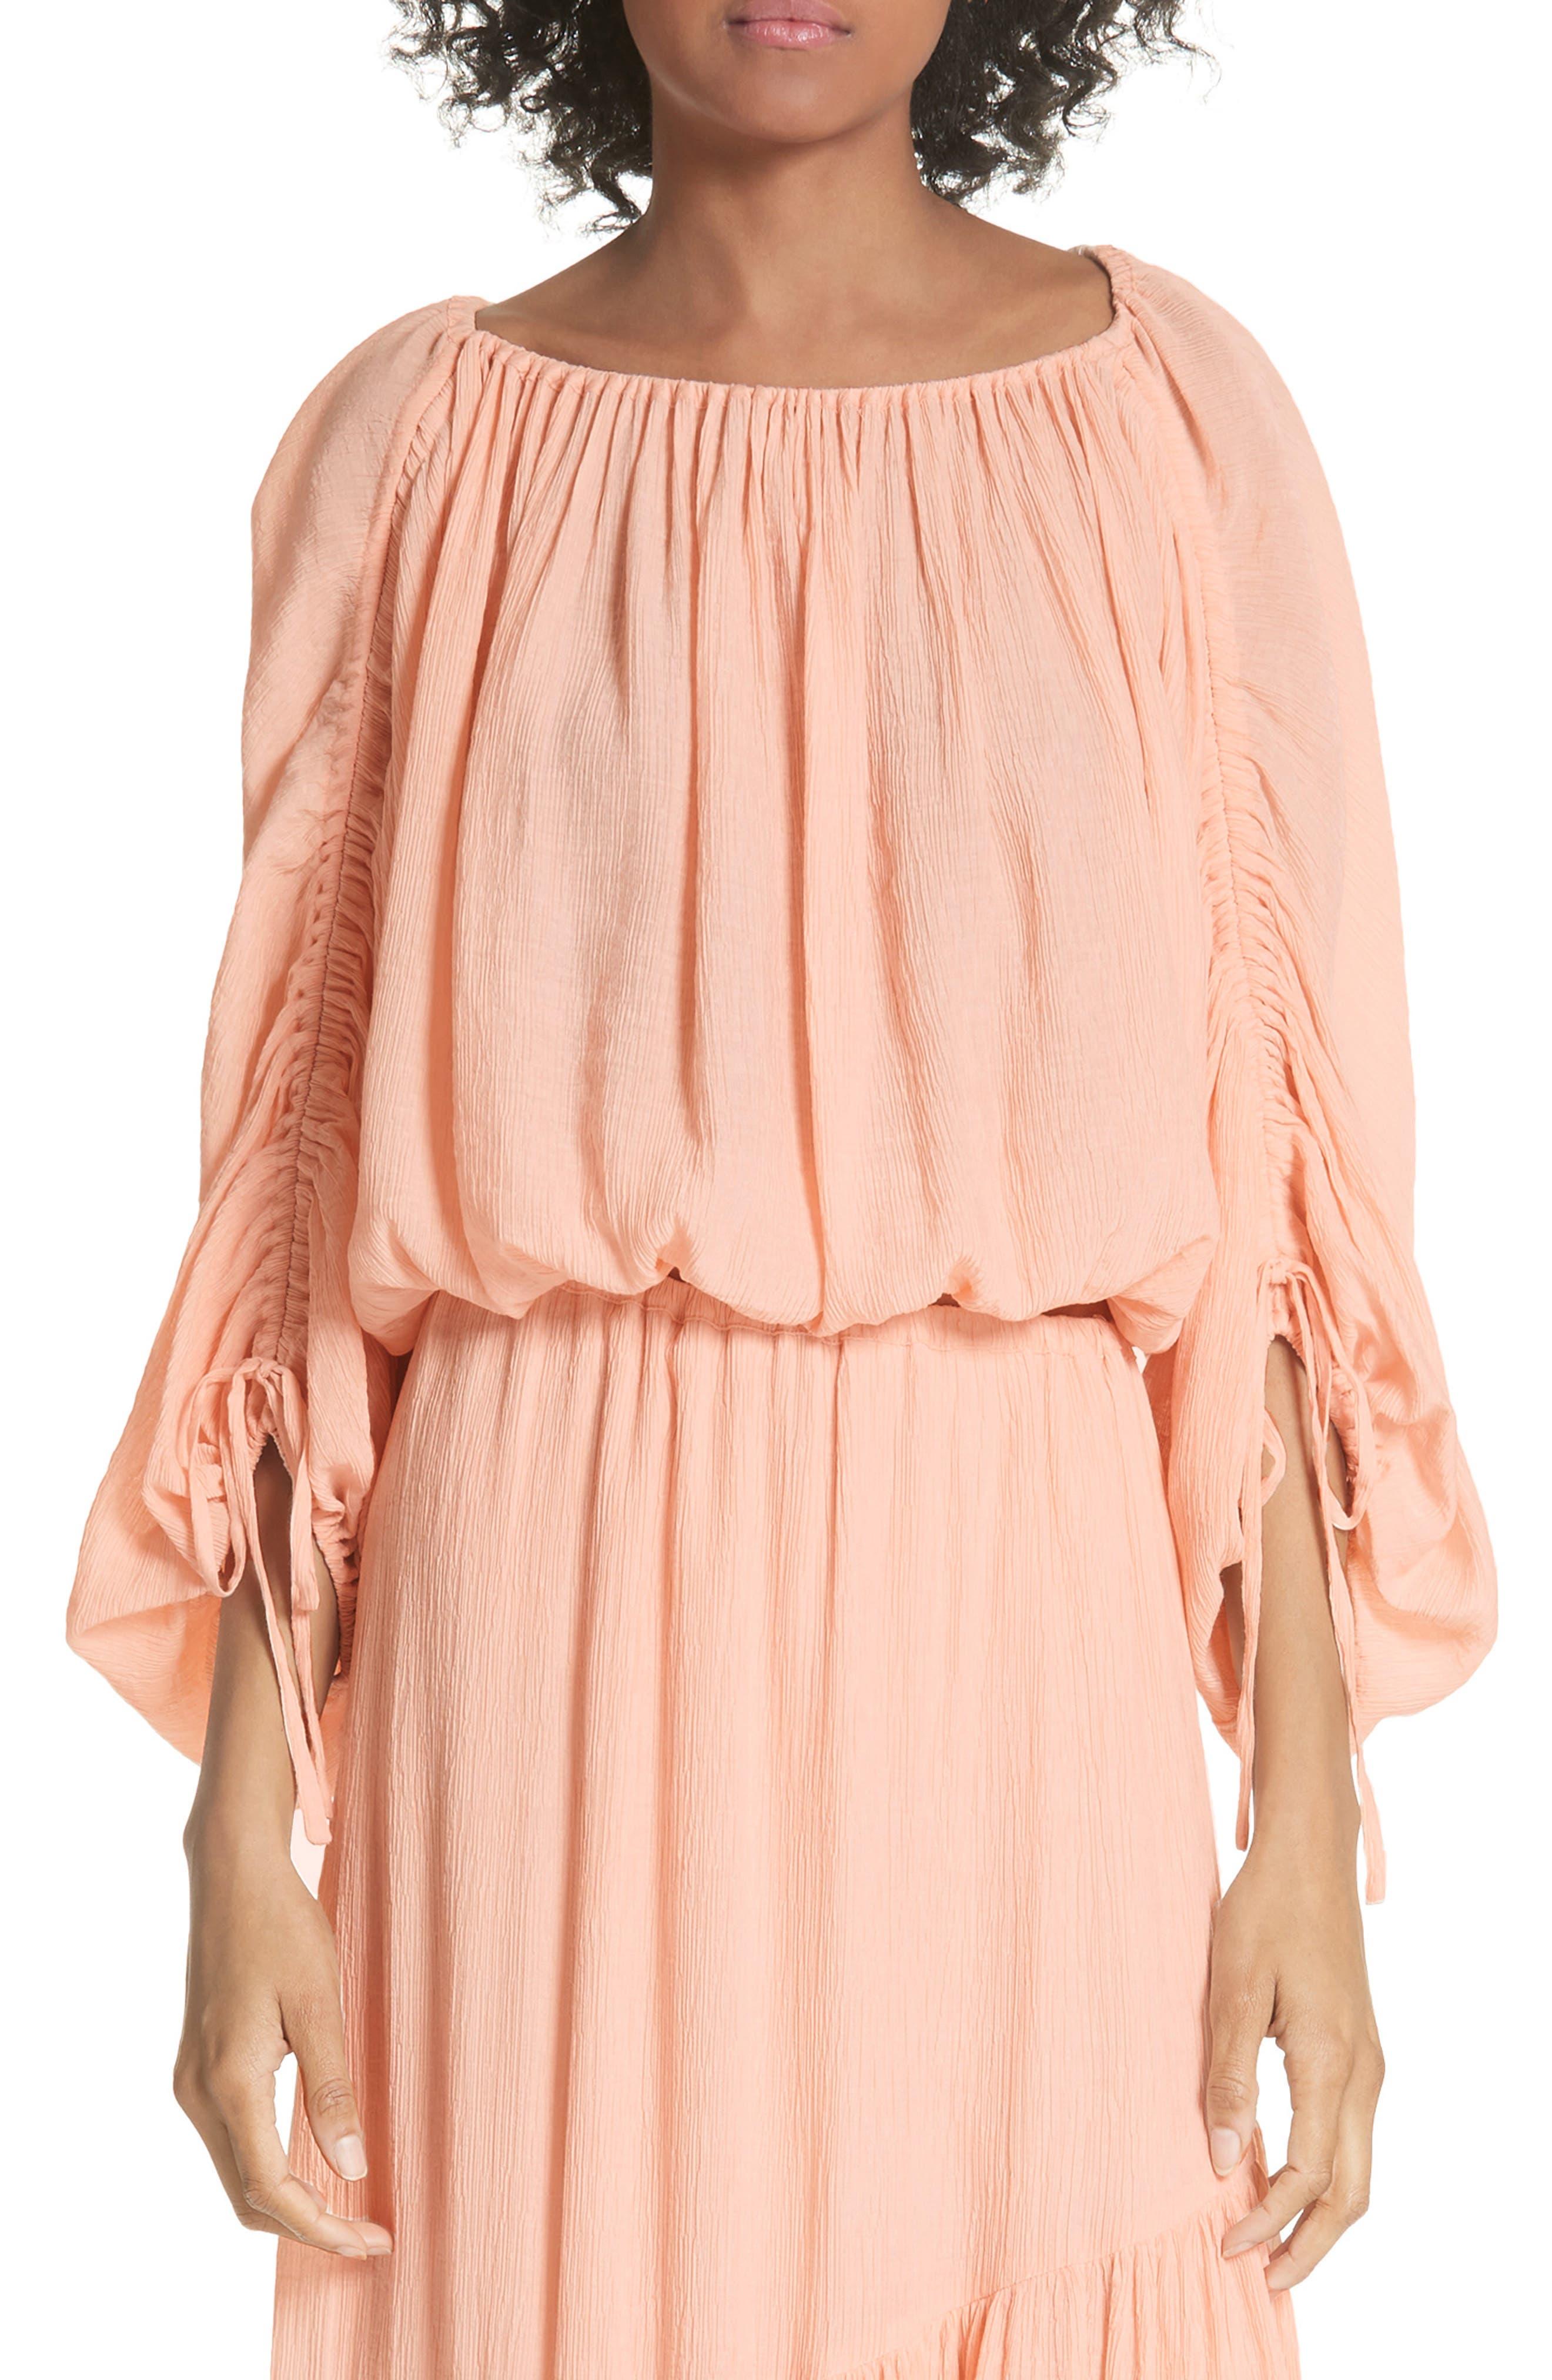 Elazara Ruched Sleeve Peasant Top,                         Main,                         color, Summer Pink